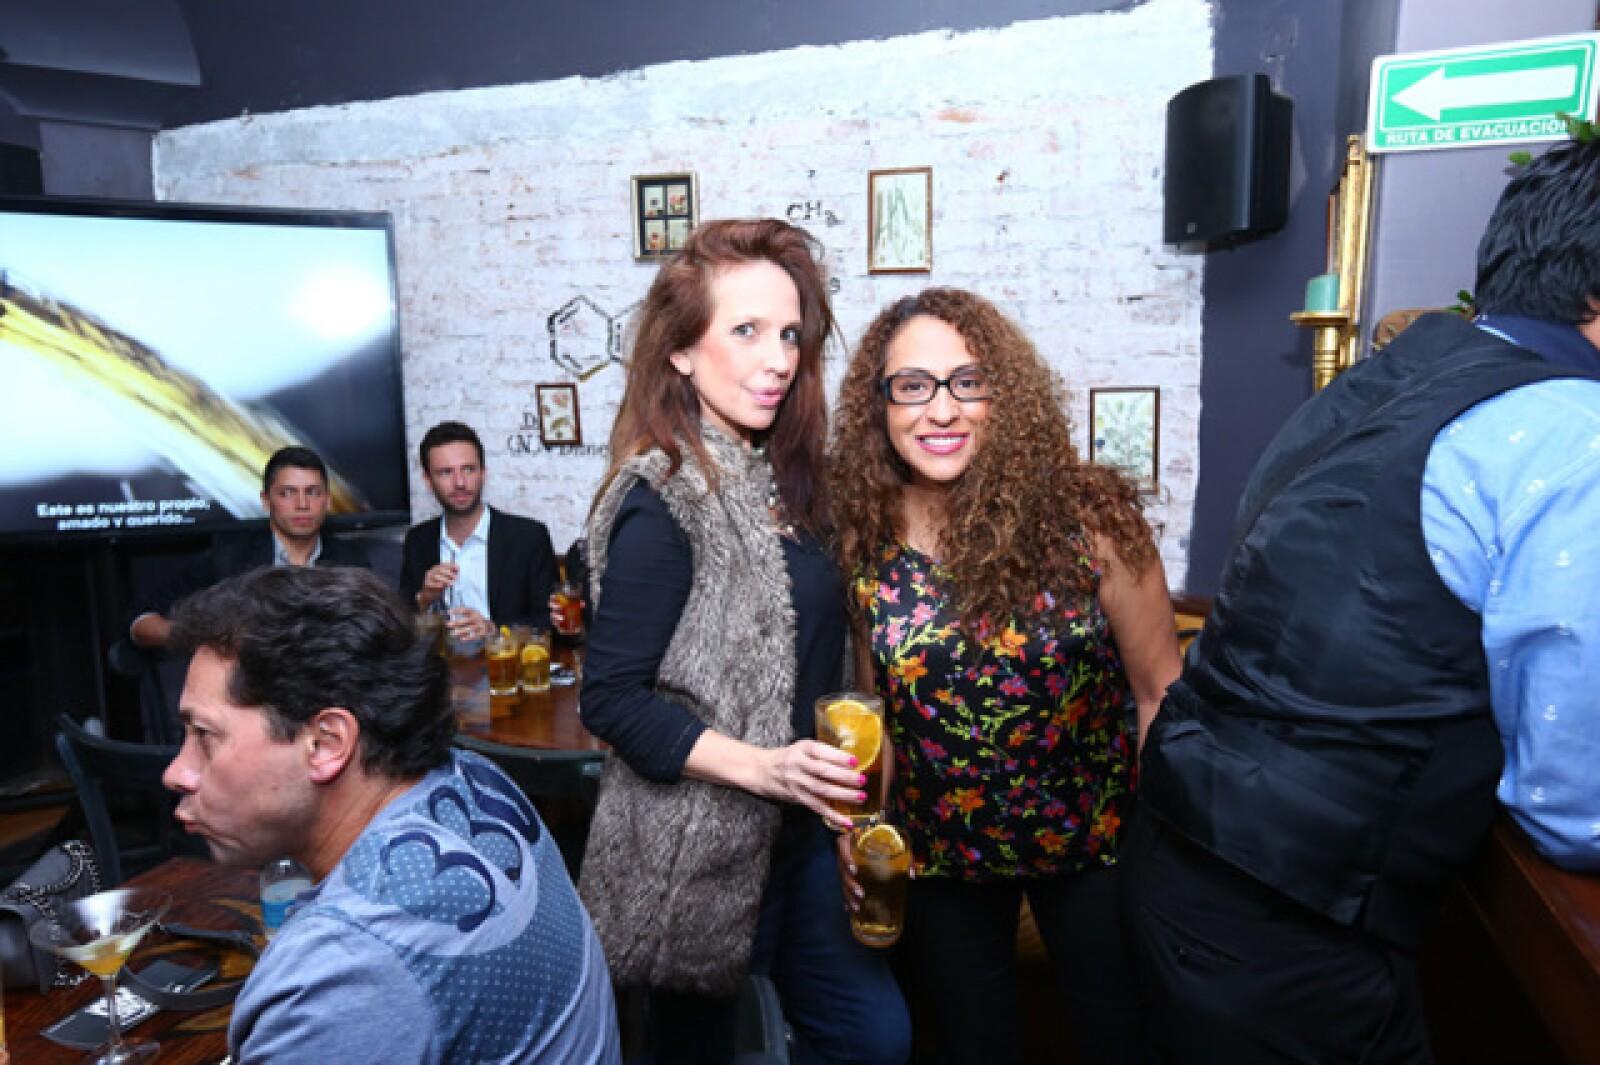 Laura Valero y Valeria Pérez-Fraga